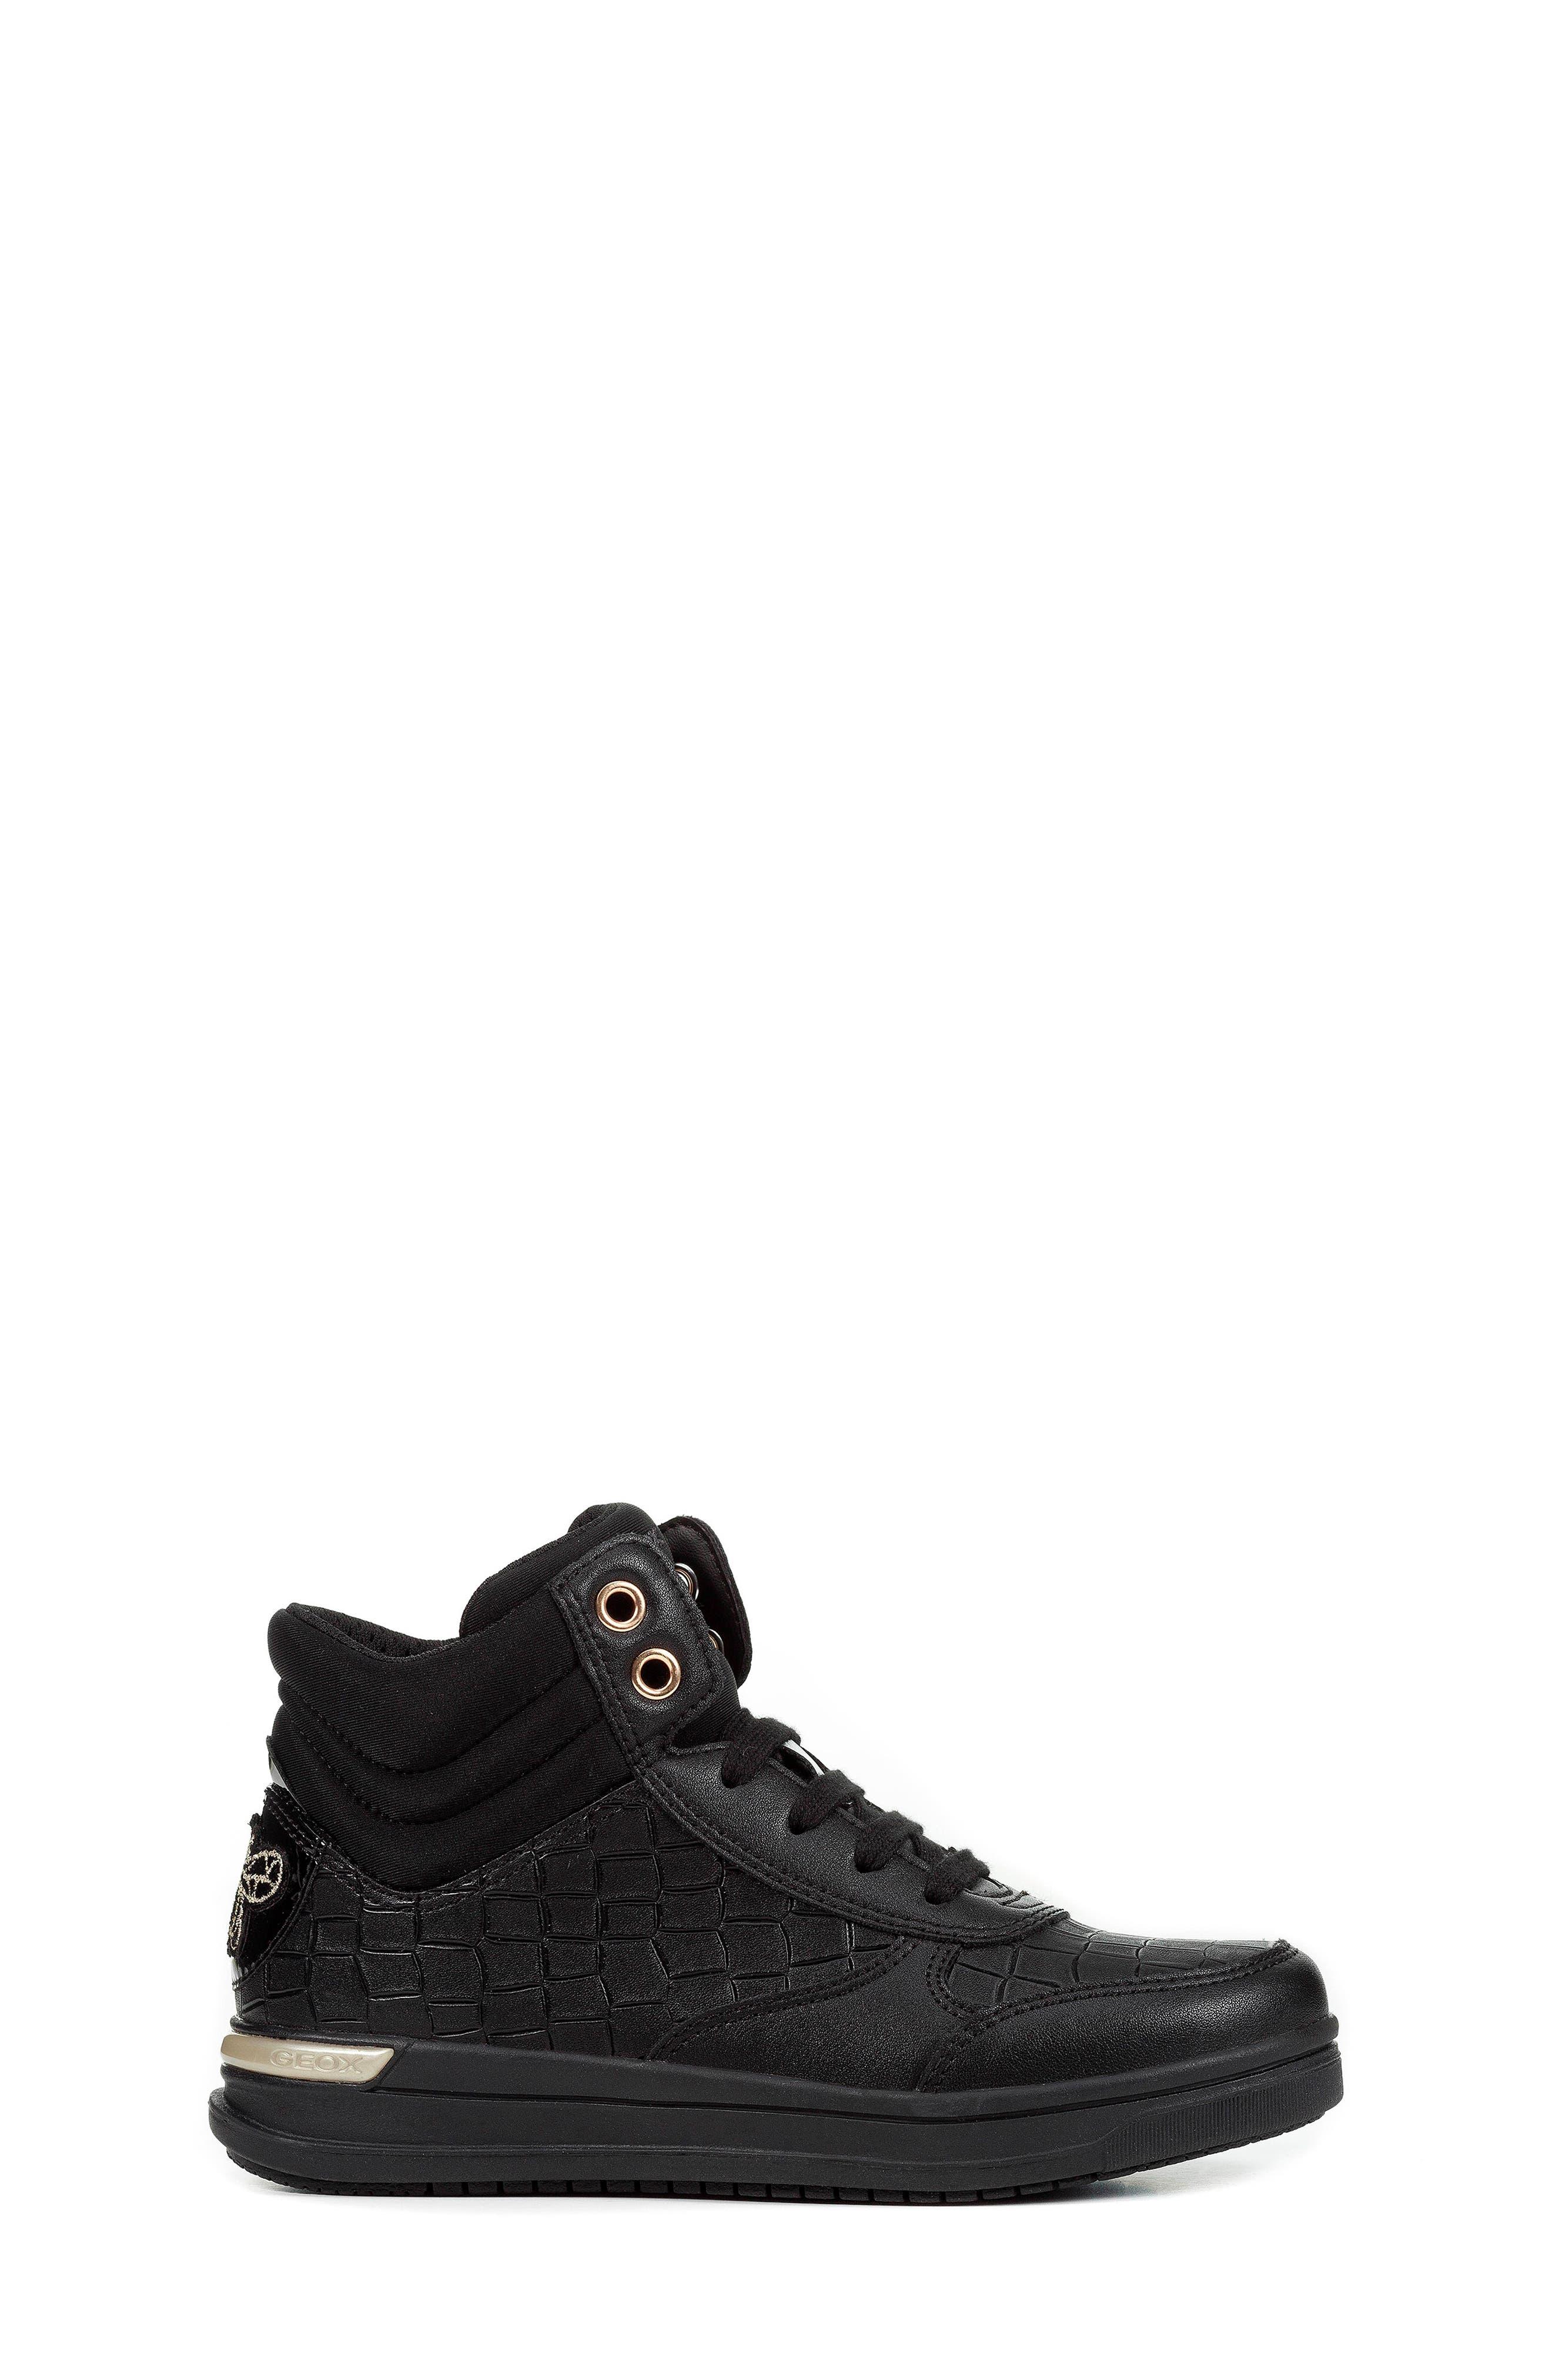 Aveup High Top Sneaker,                             Alternate thumbnail 3, color,                             BLACK